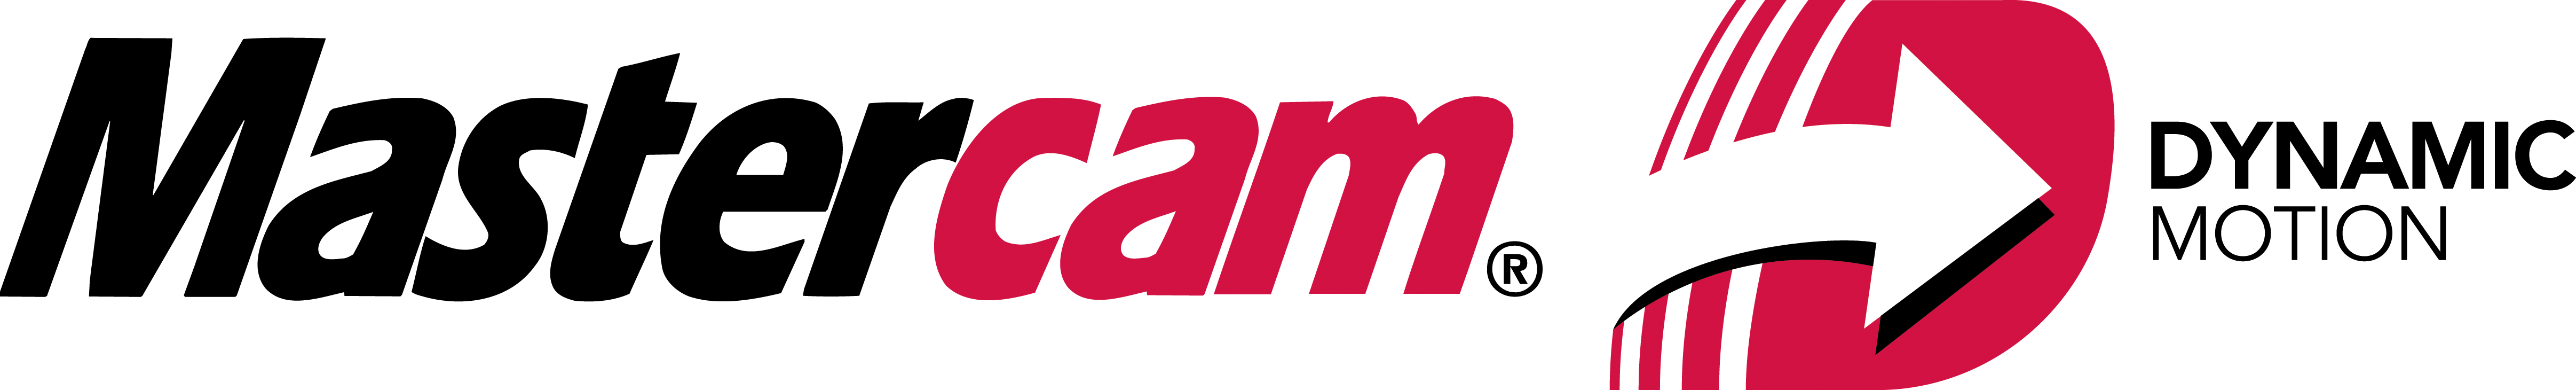 DynamicMotion-Mastercam Plus Logo